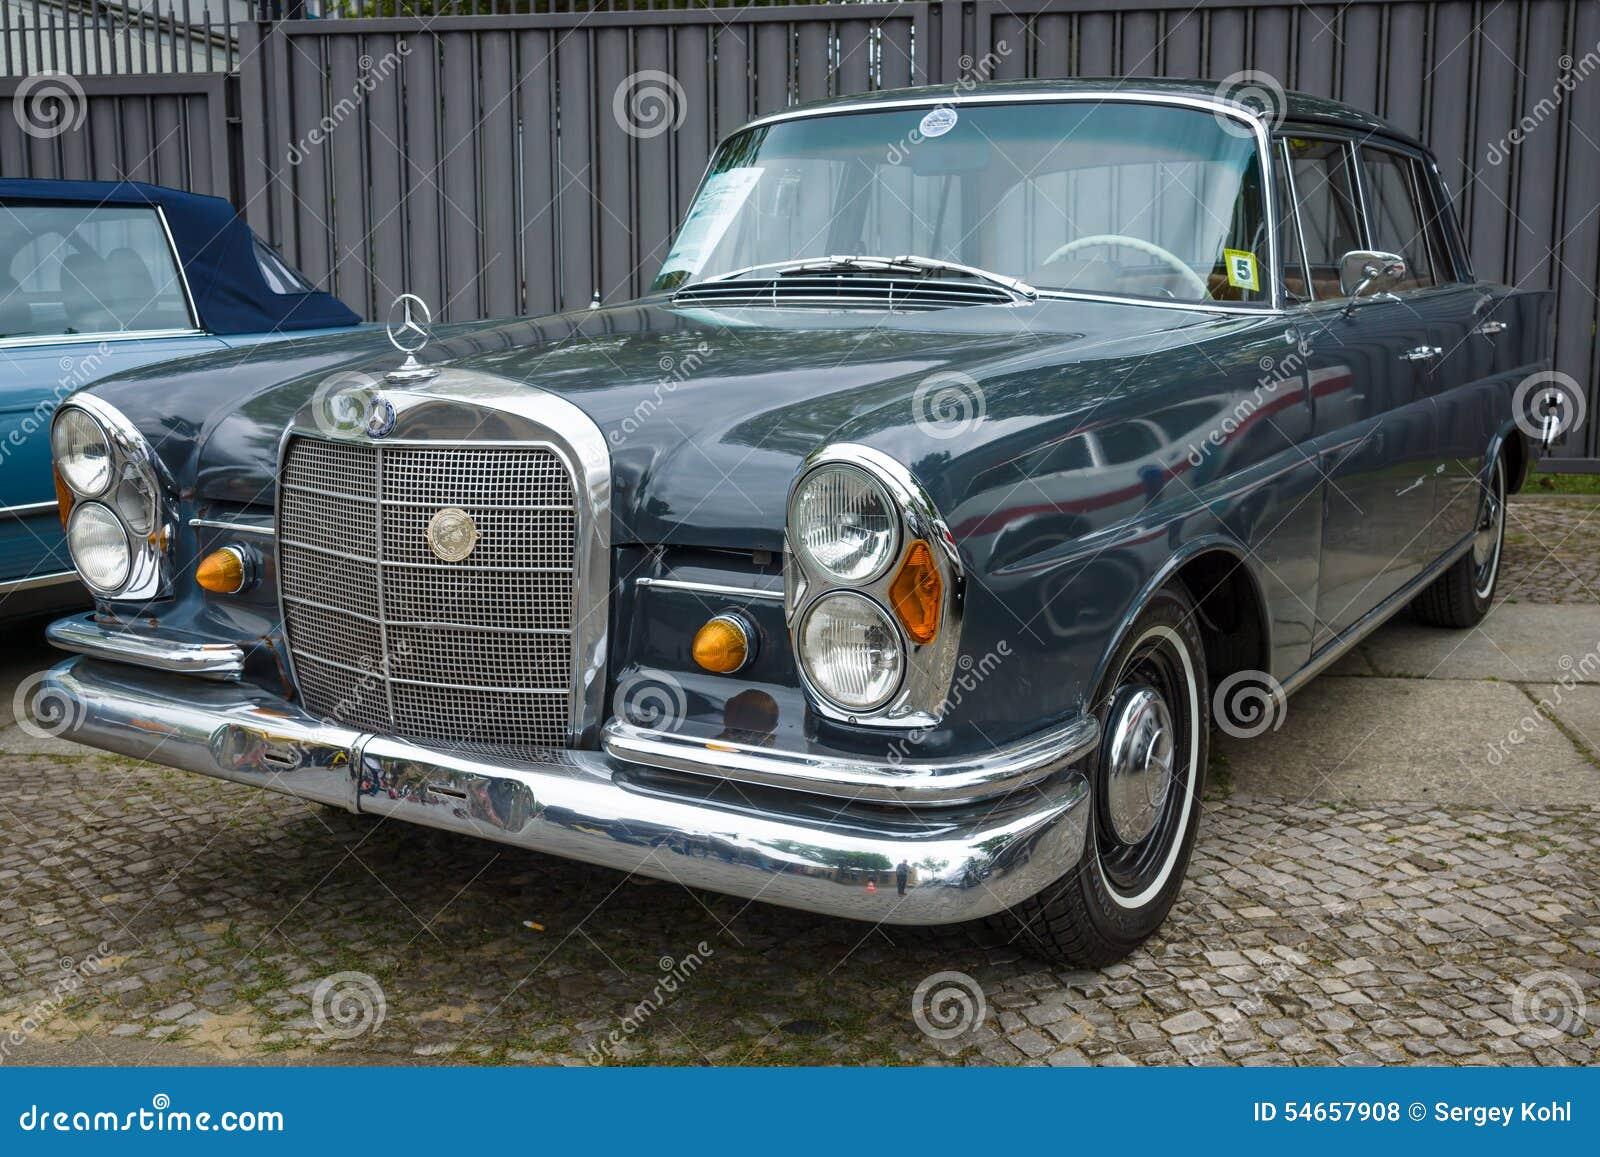 Full size luxury car mercedes benz 230s w111 1966 for Mercedes benz luxury truck